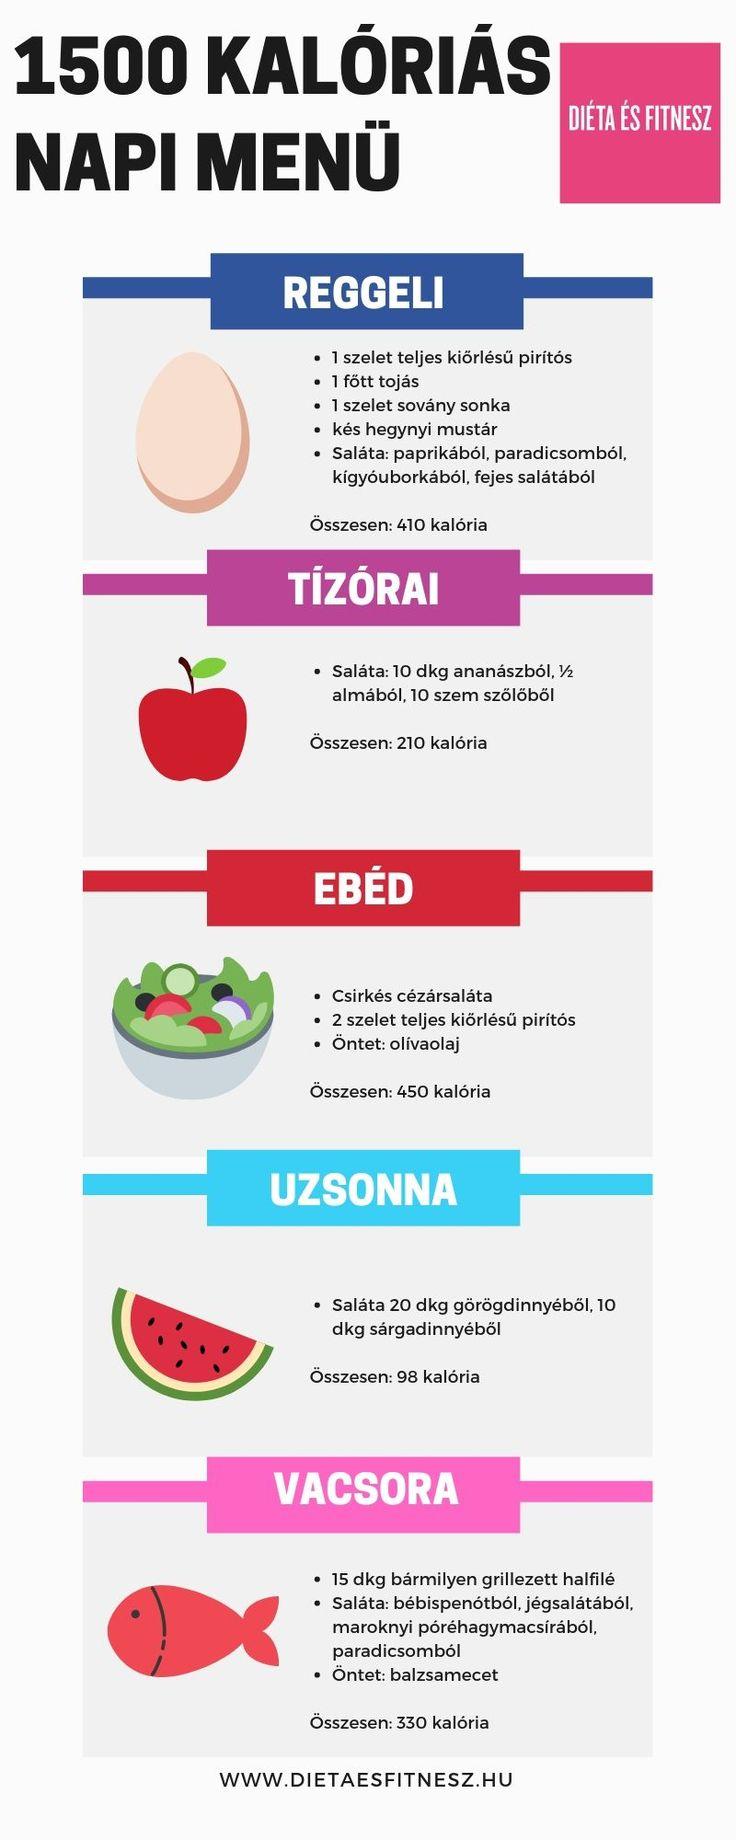 1500 kalóriás napi menü #étrend #kalória #diéta ekkor..